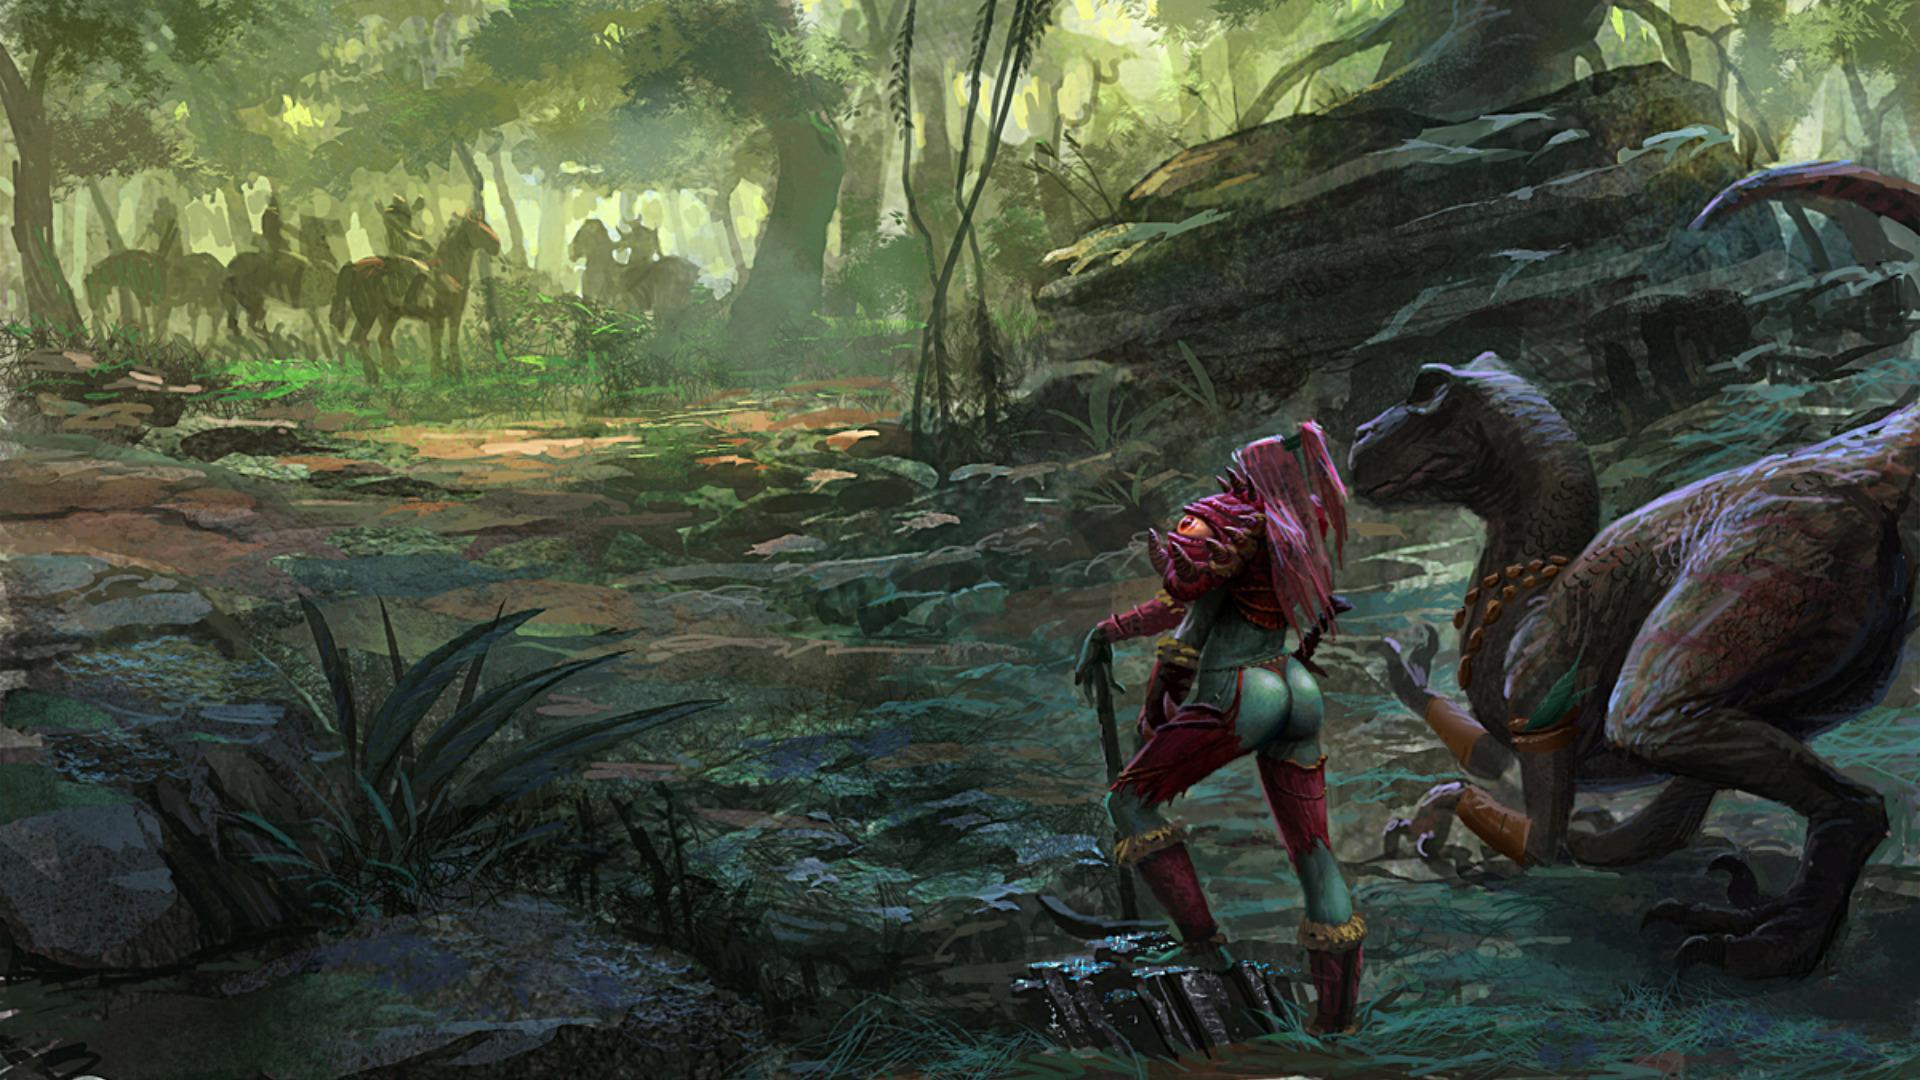 Jungle Wallpaper World Of Warcraft: Other HD Wallpaper